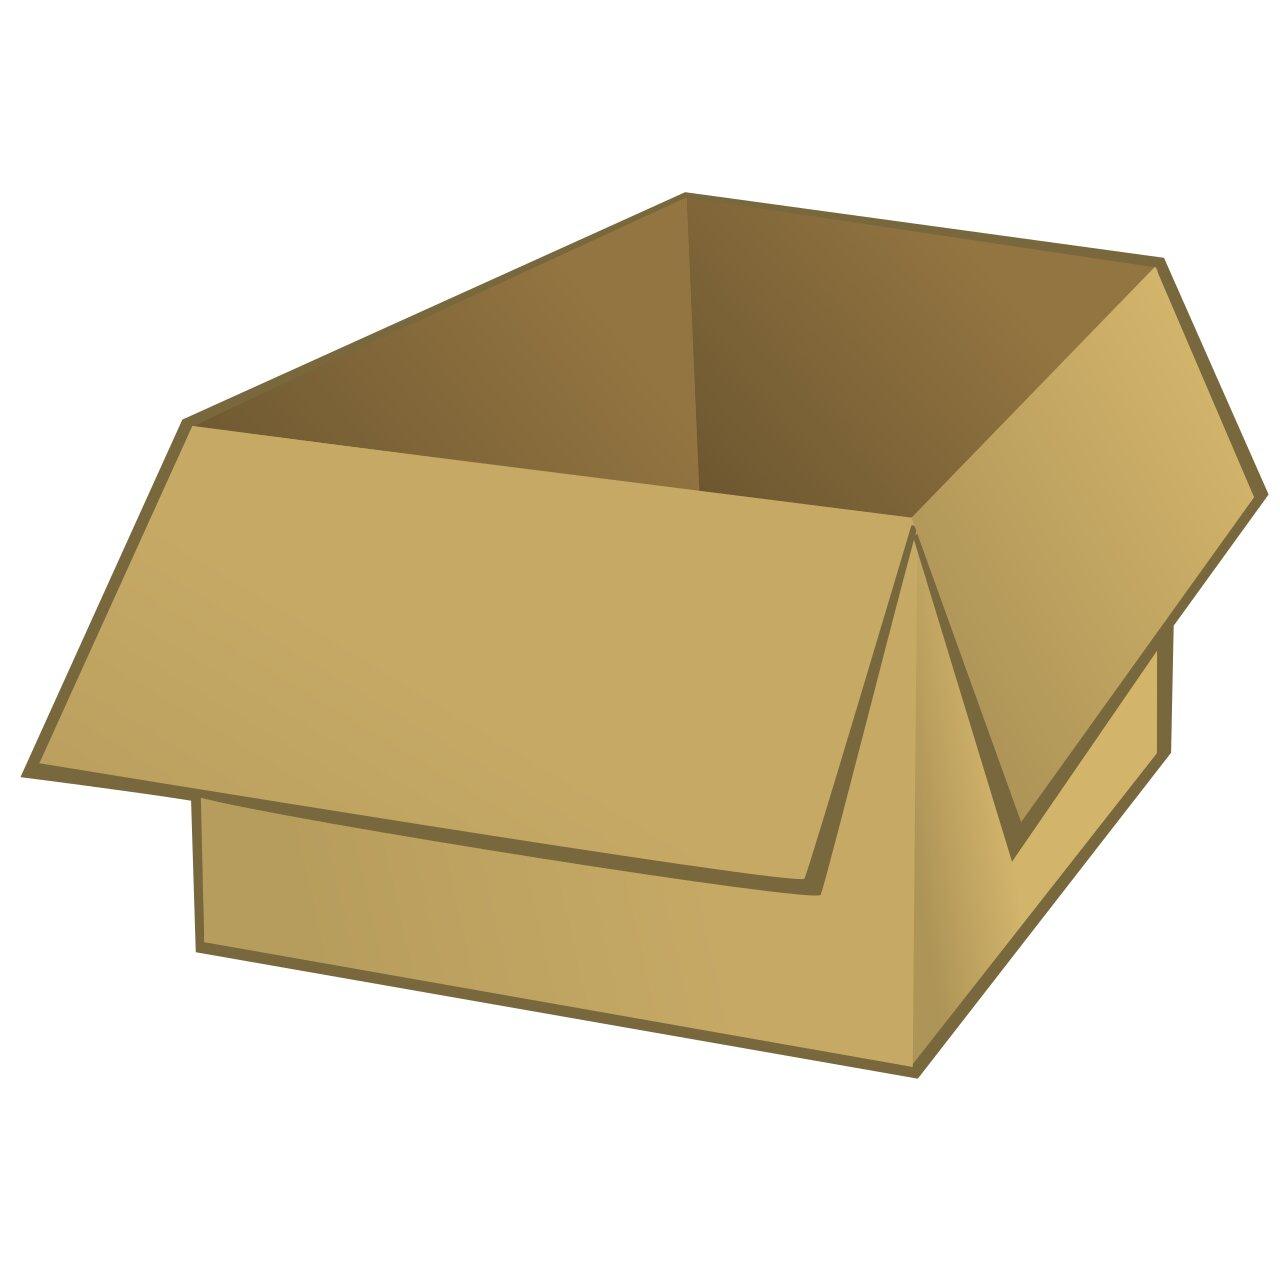 nicubunu_Open_box